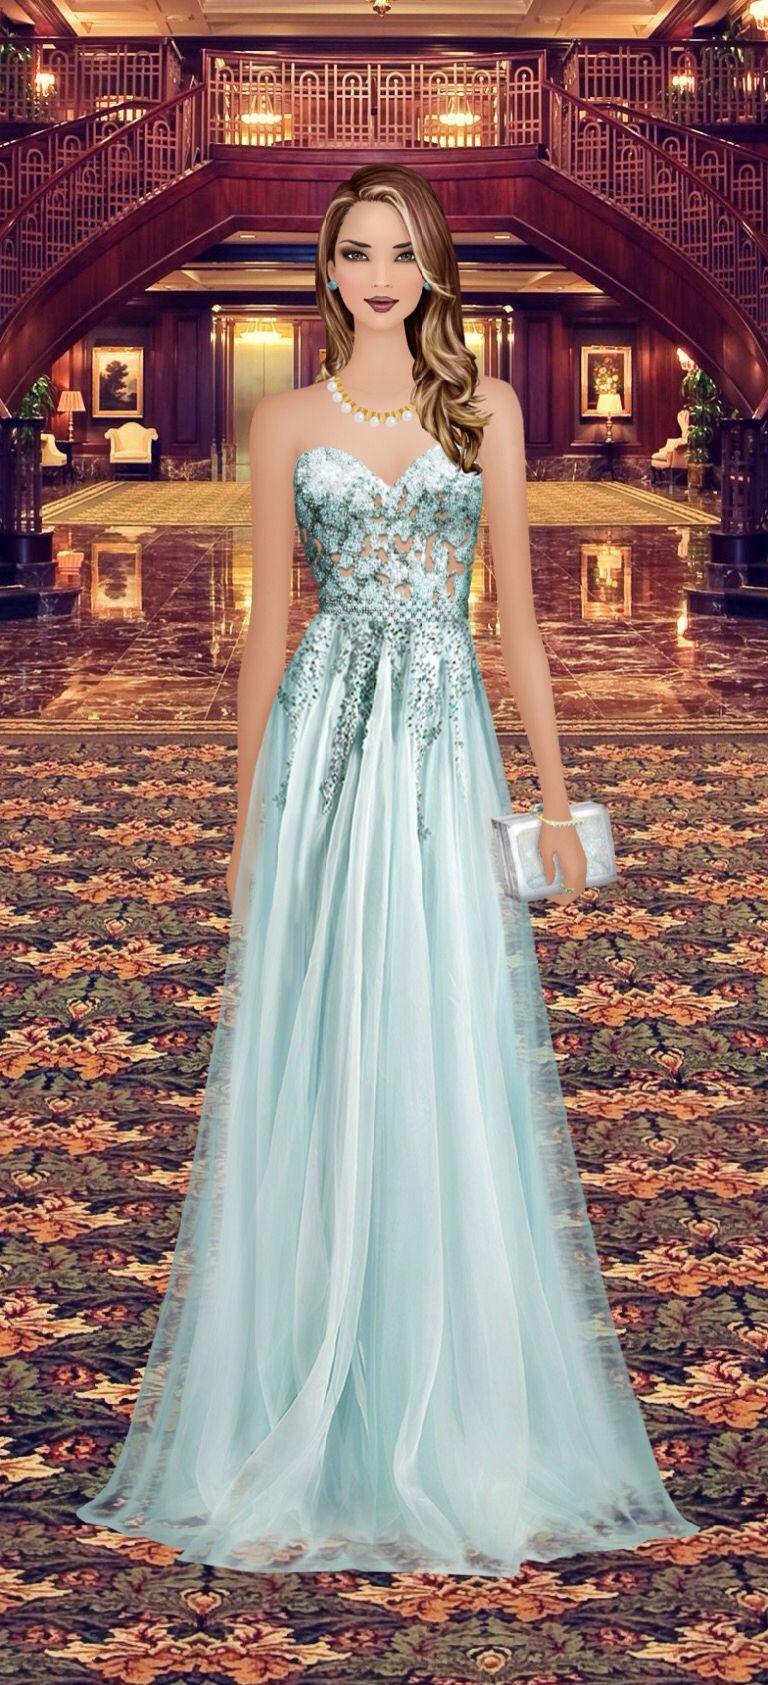 Pin by christina pappa on Dresses | Pinterest | Covet fashion, Greek ...